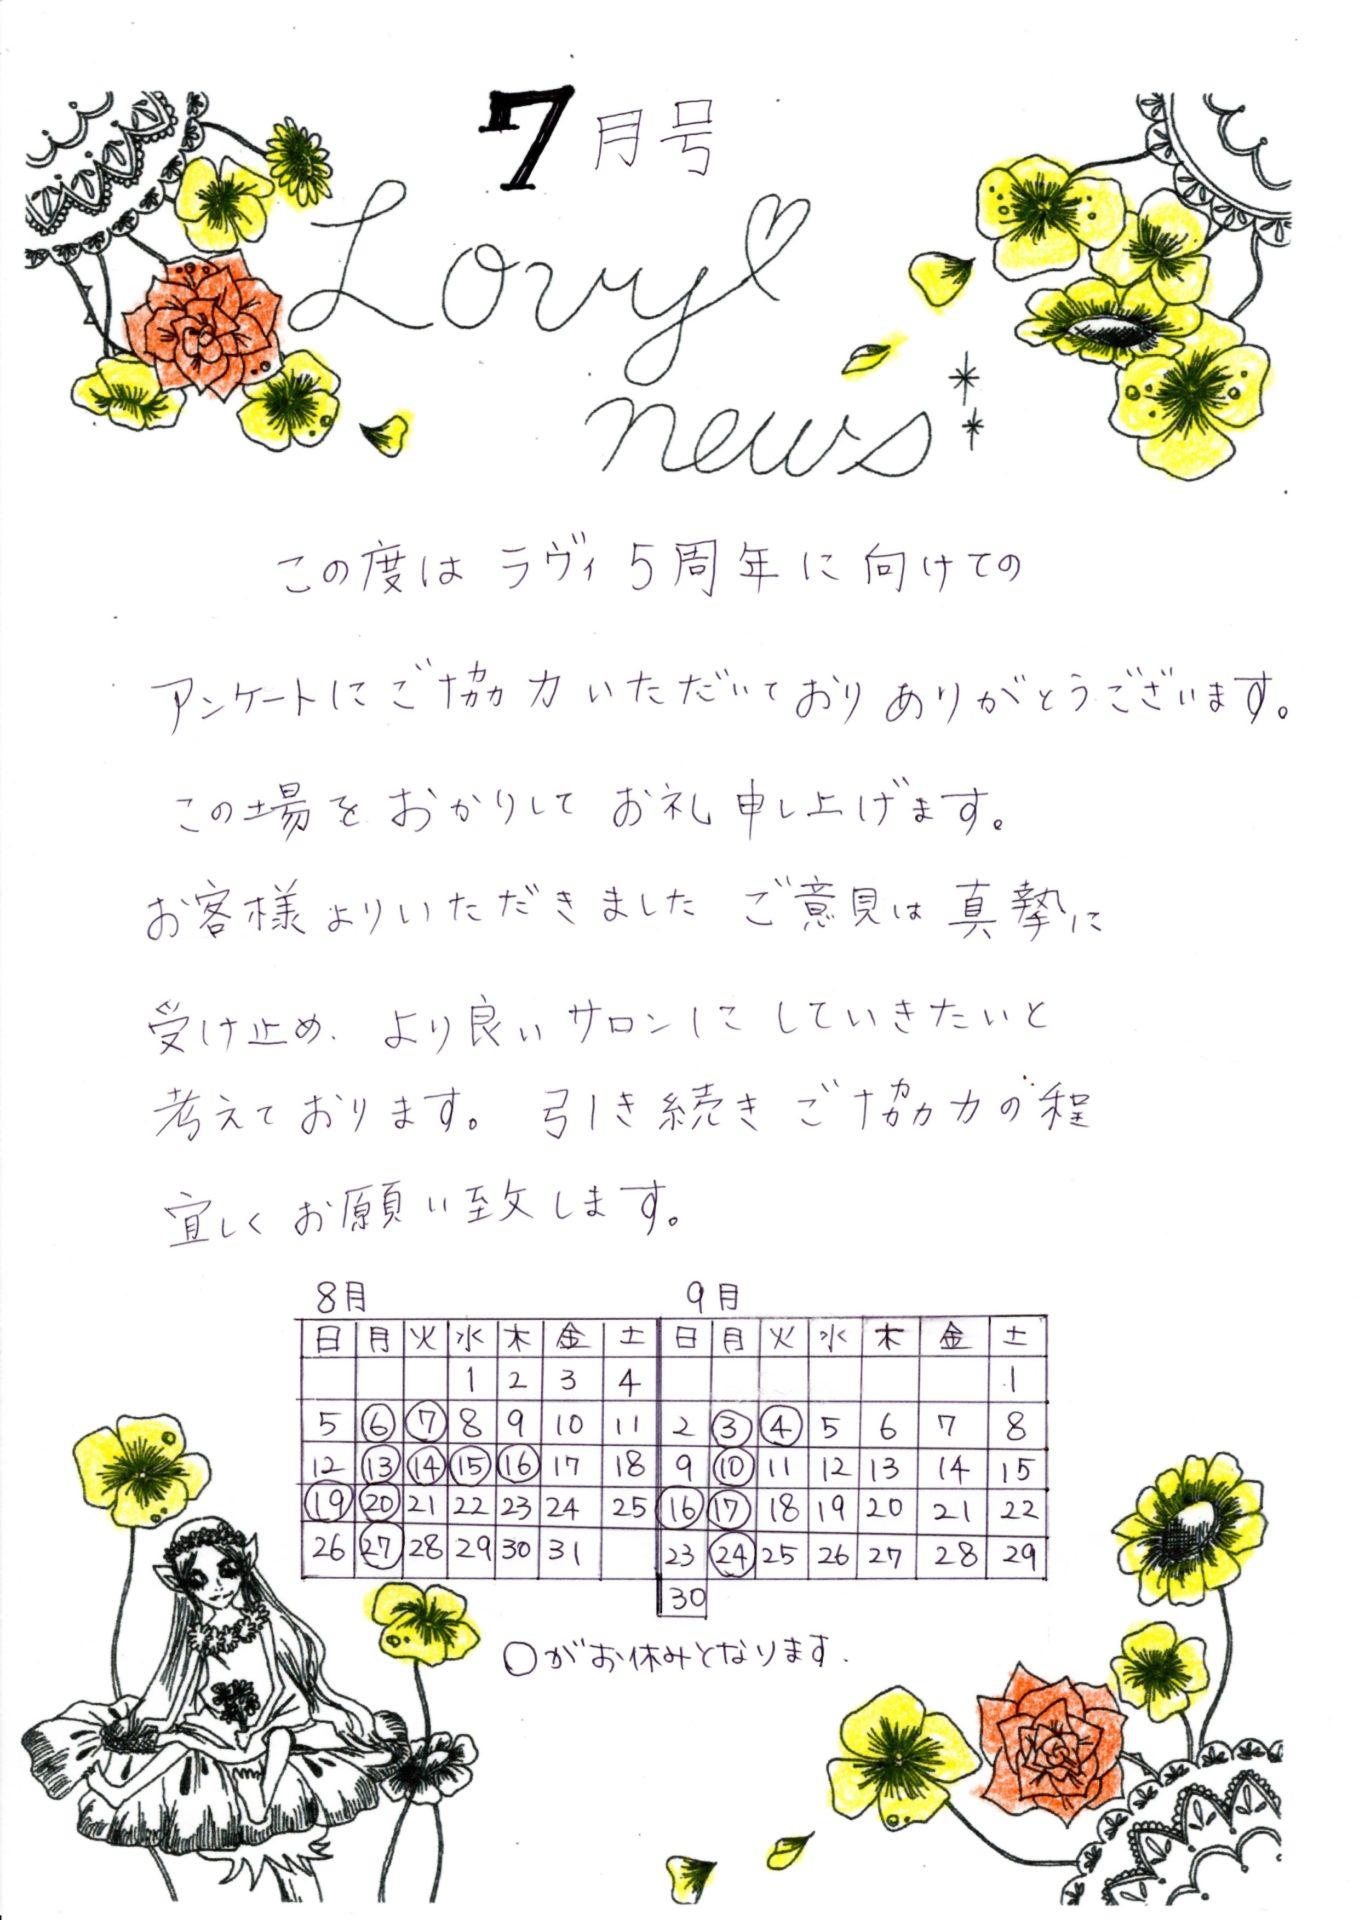 Lovy新聞 2018/7月号